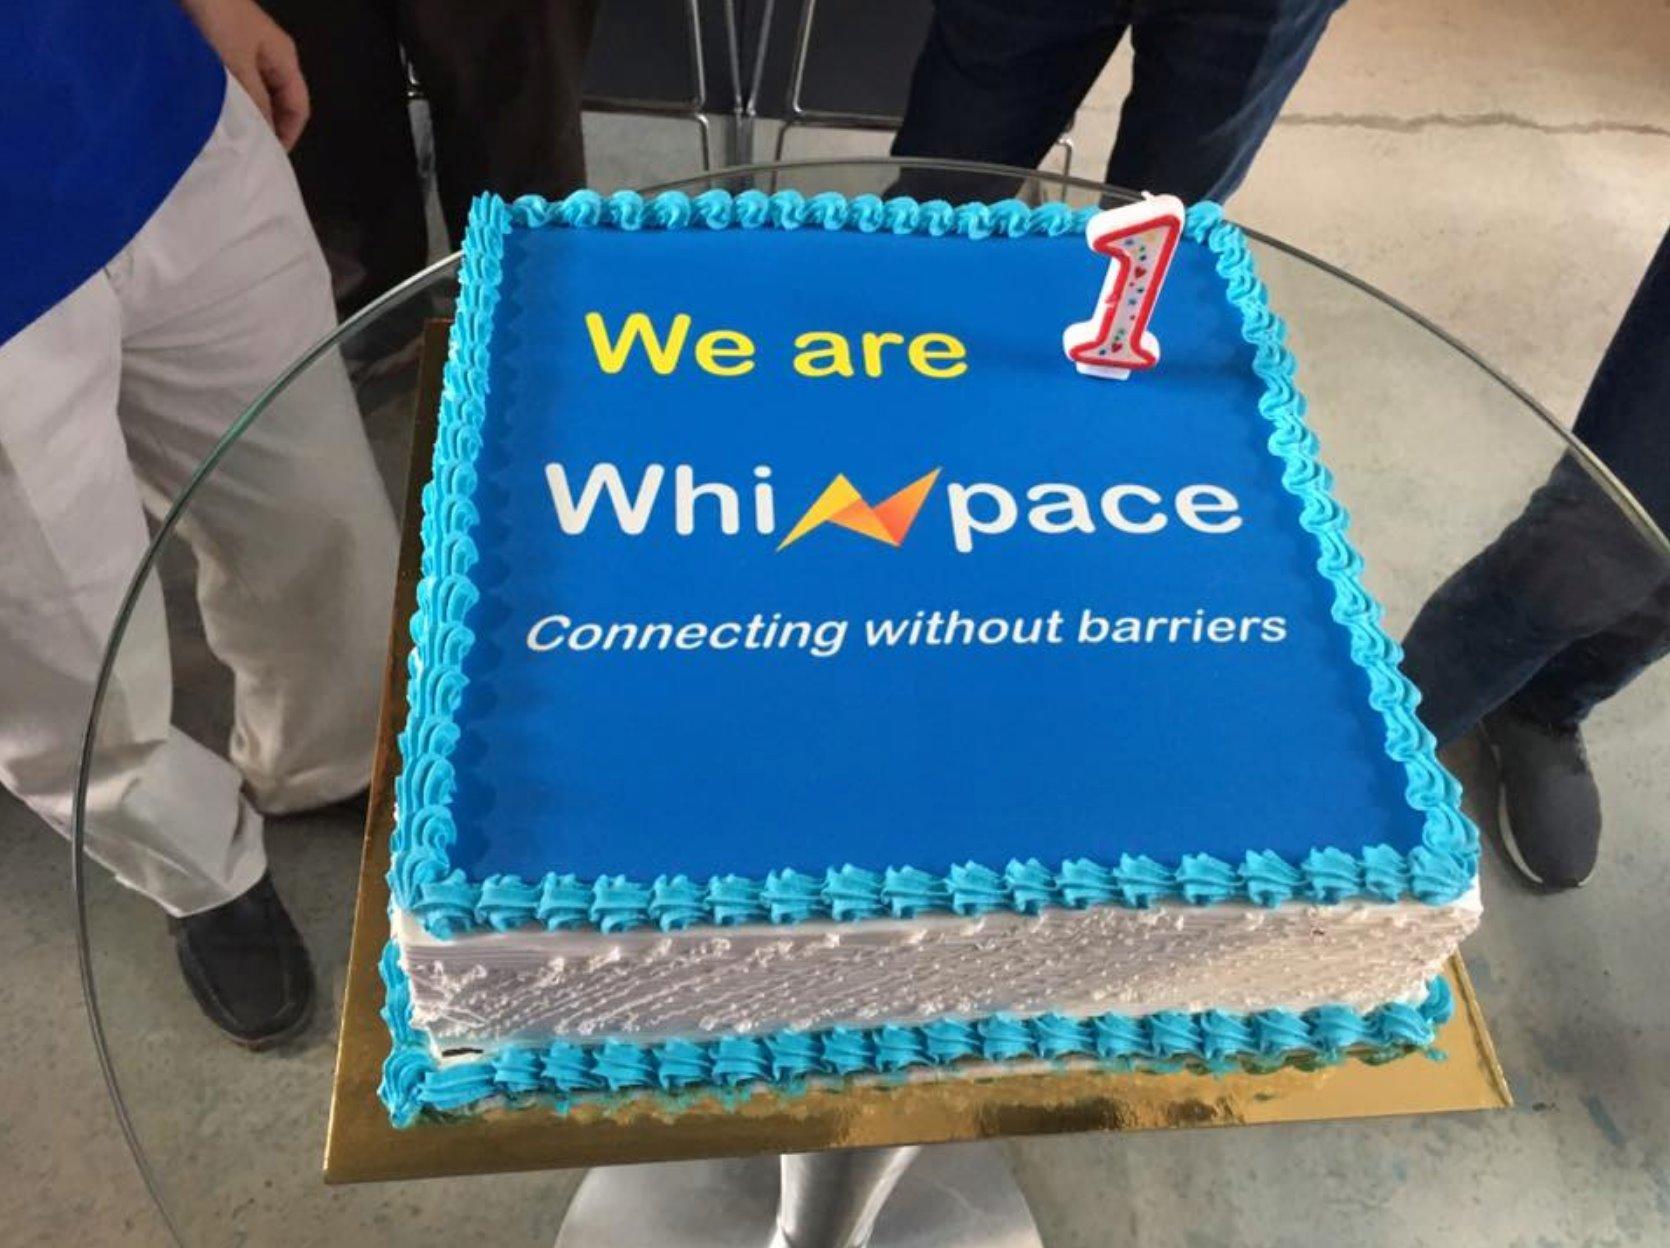 Whizpace cake